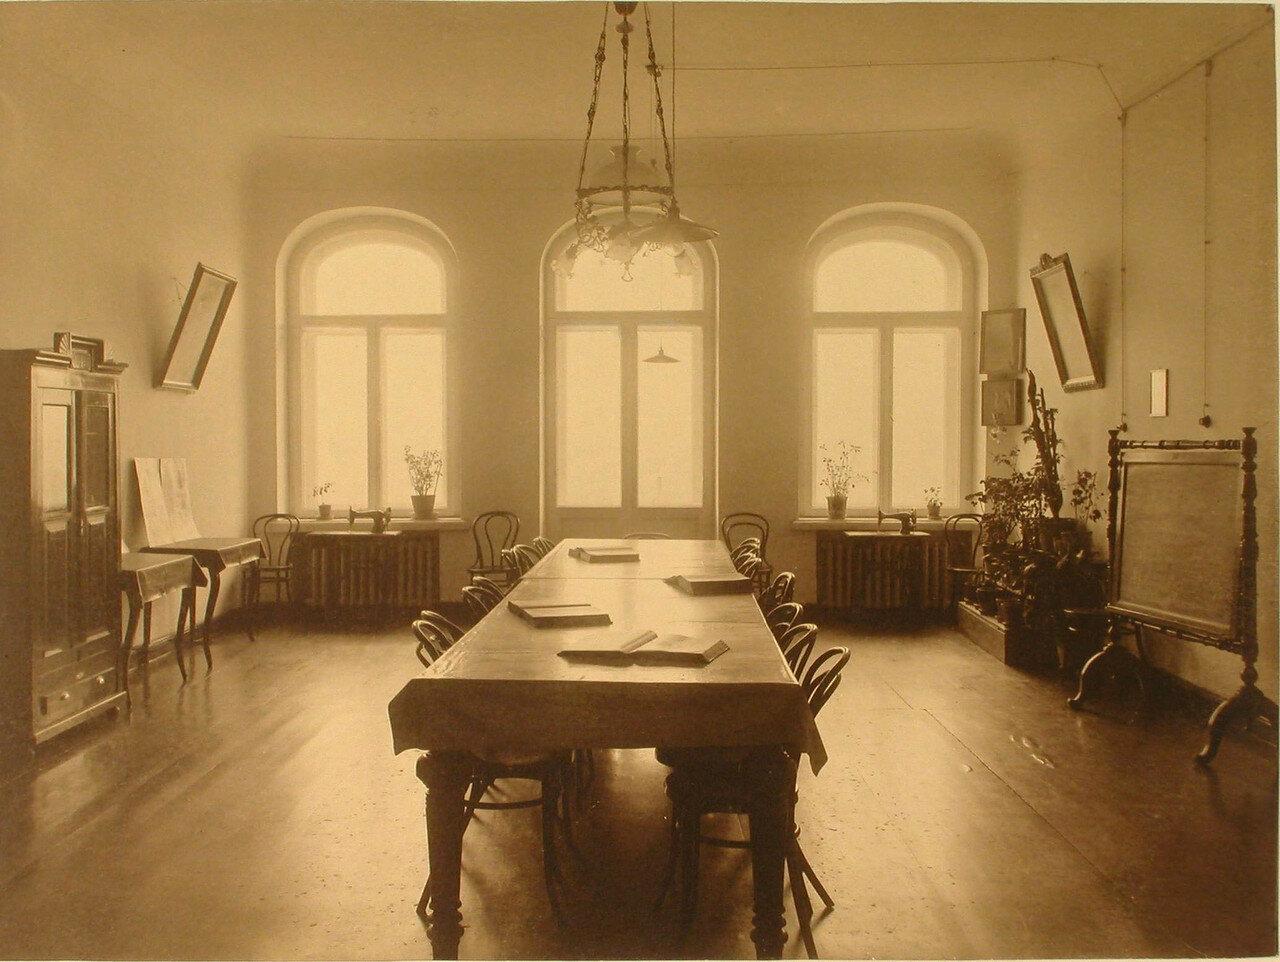 18. Вид части классной комнаты